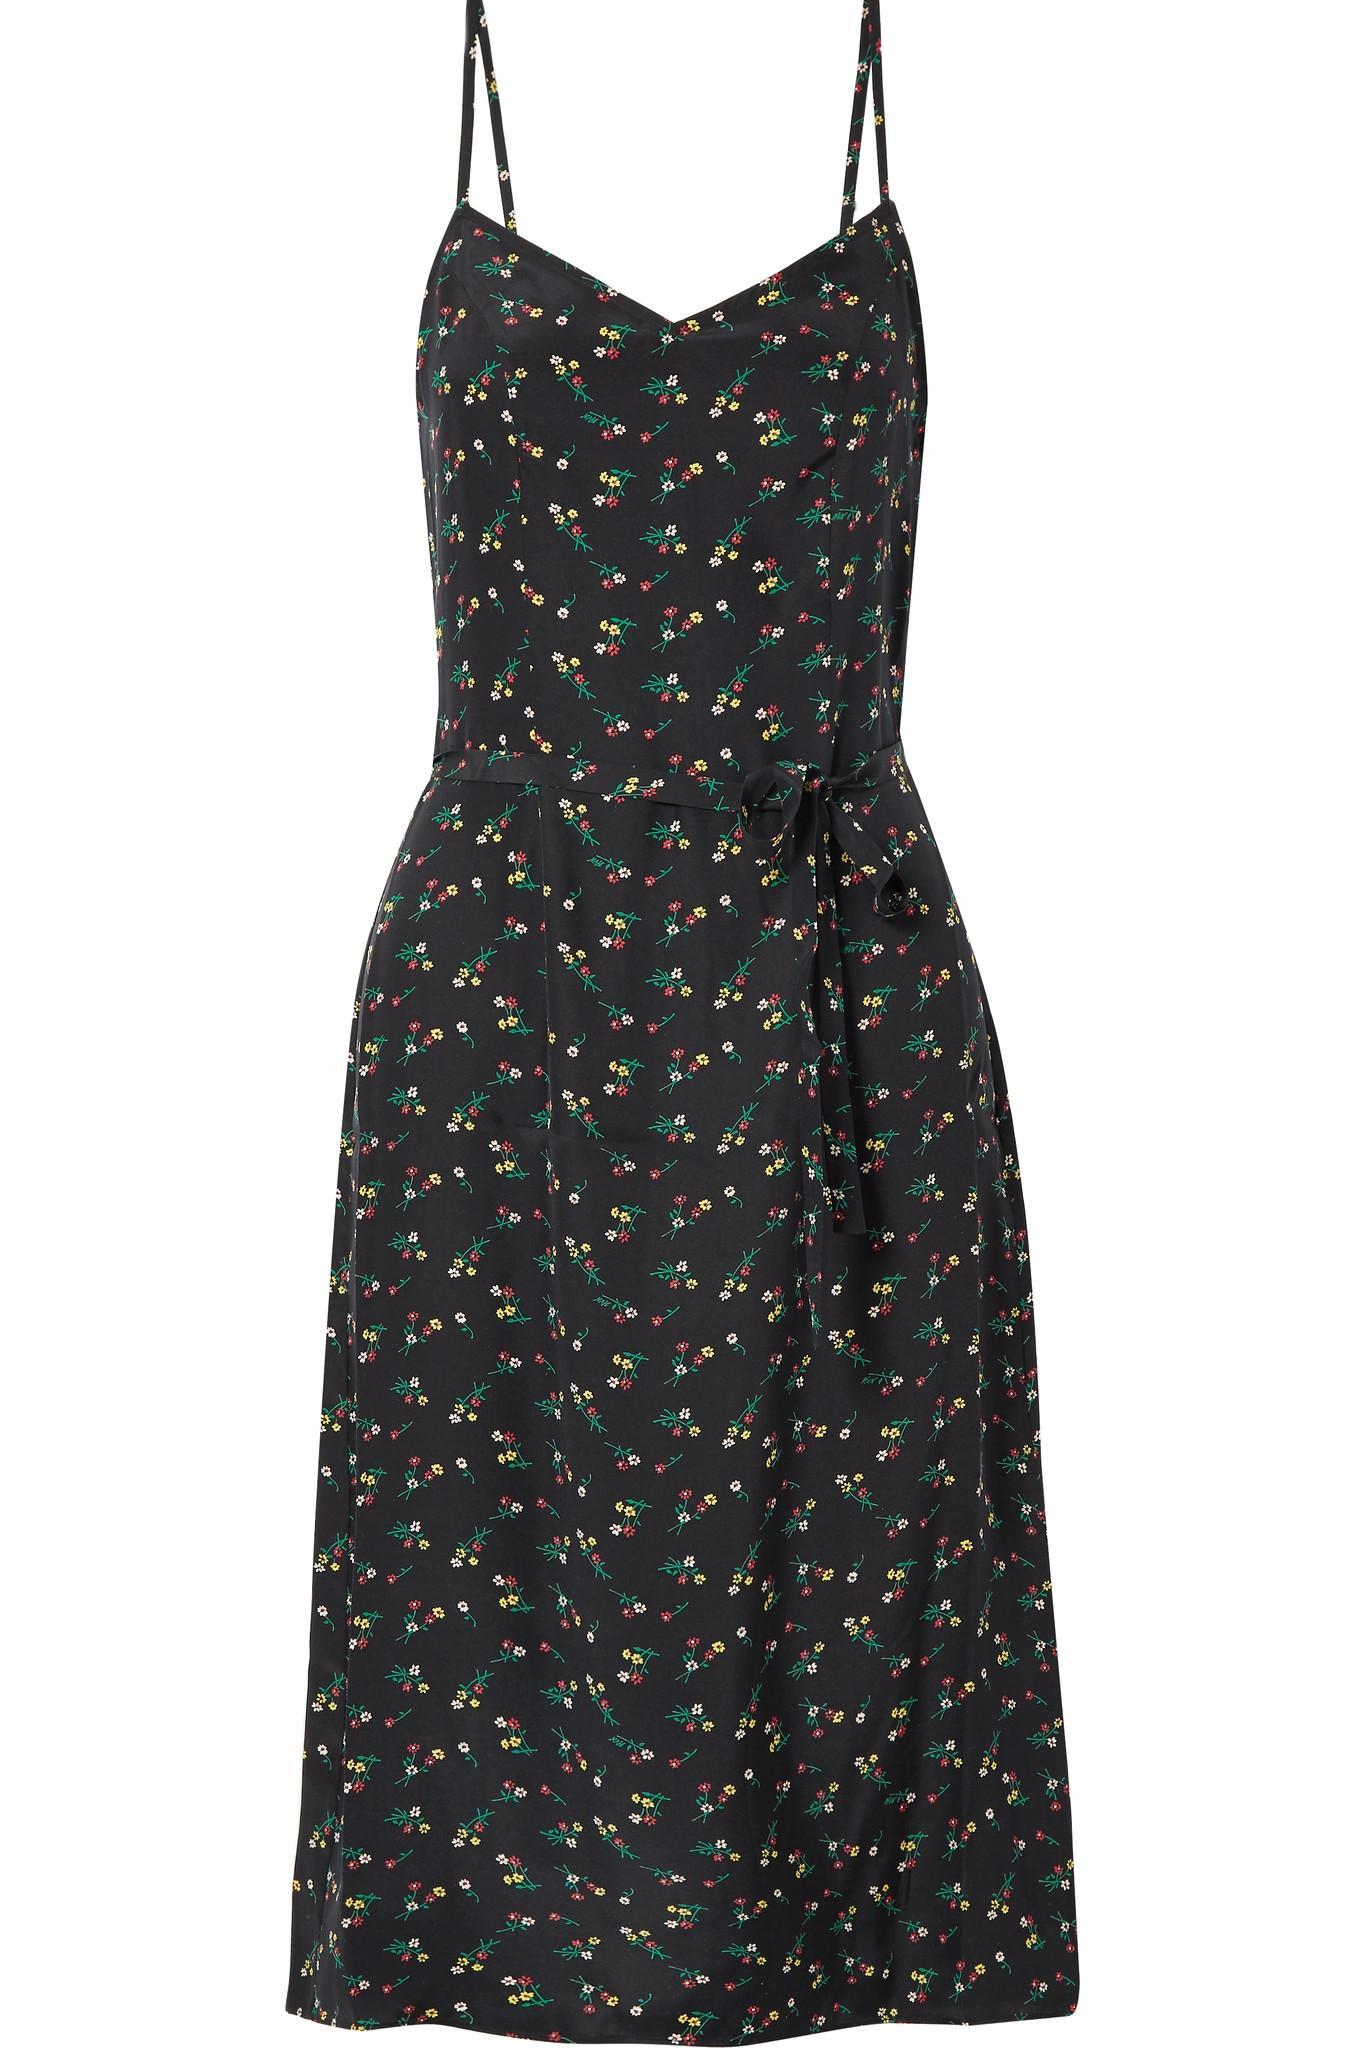 9470cb5b5b30 HVN Lily Floral-print Silk Crepe De Chine Dress in Black - Lyst